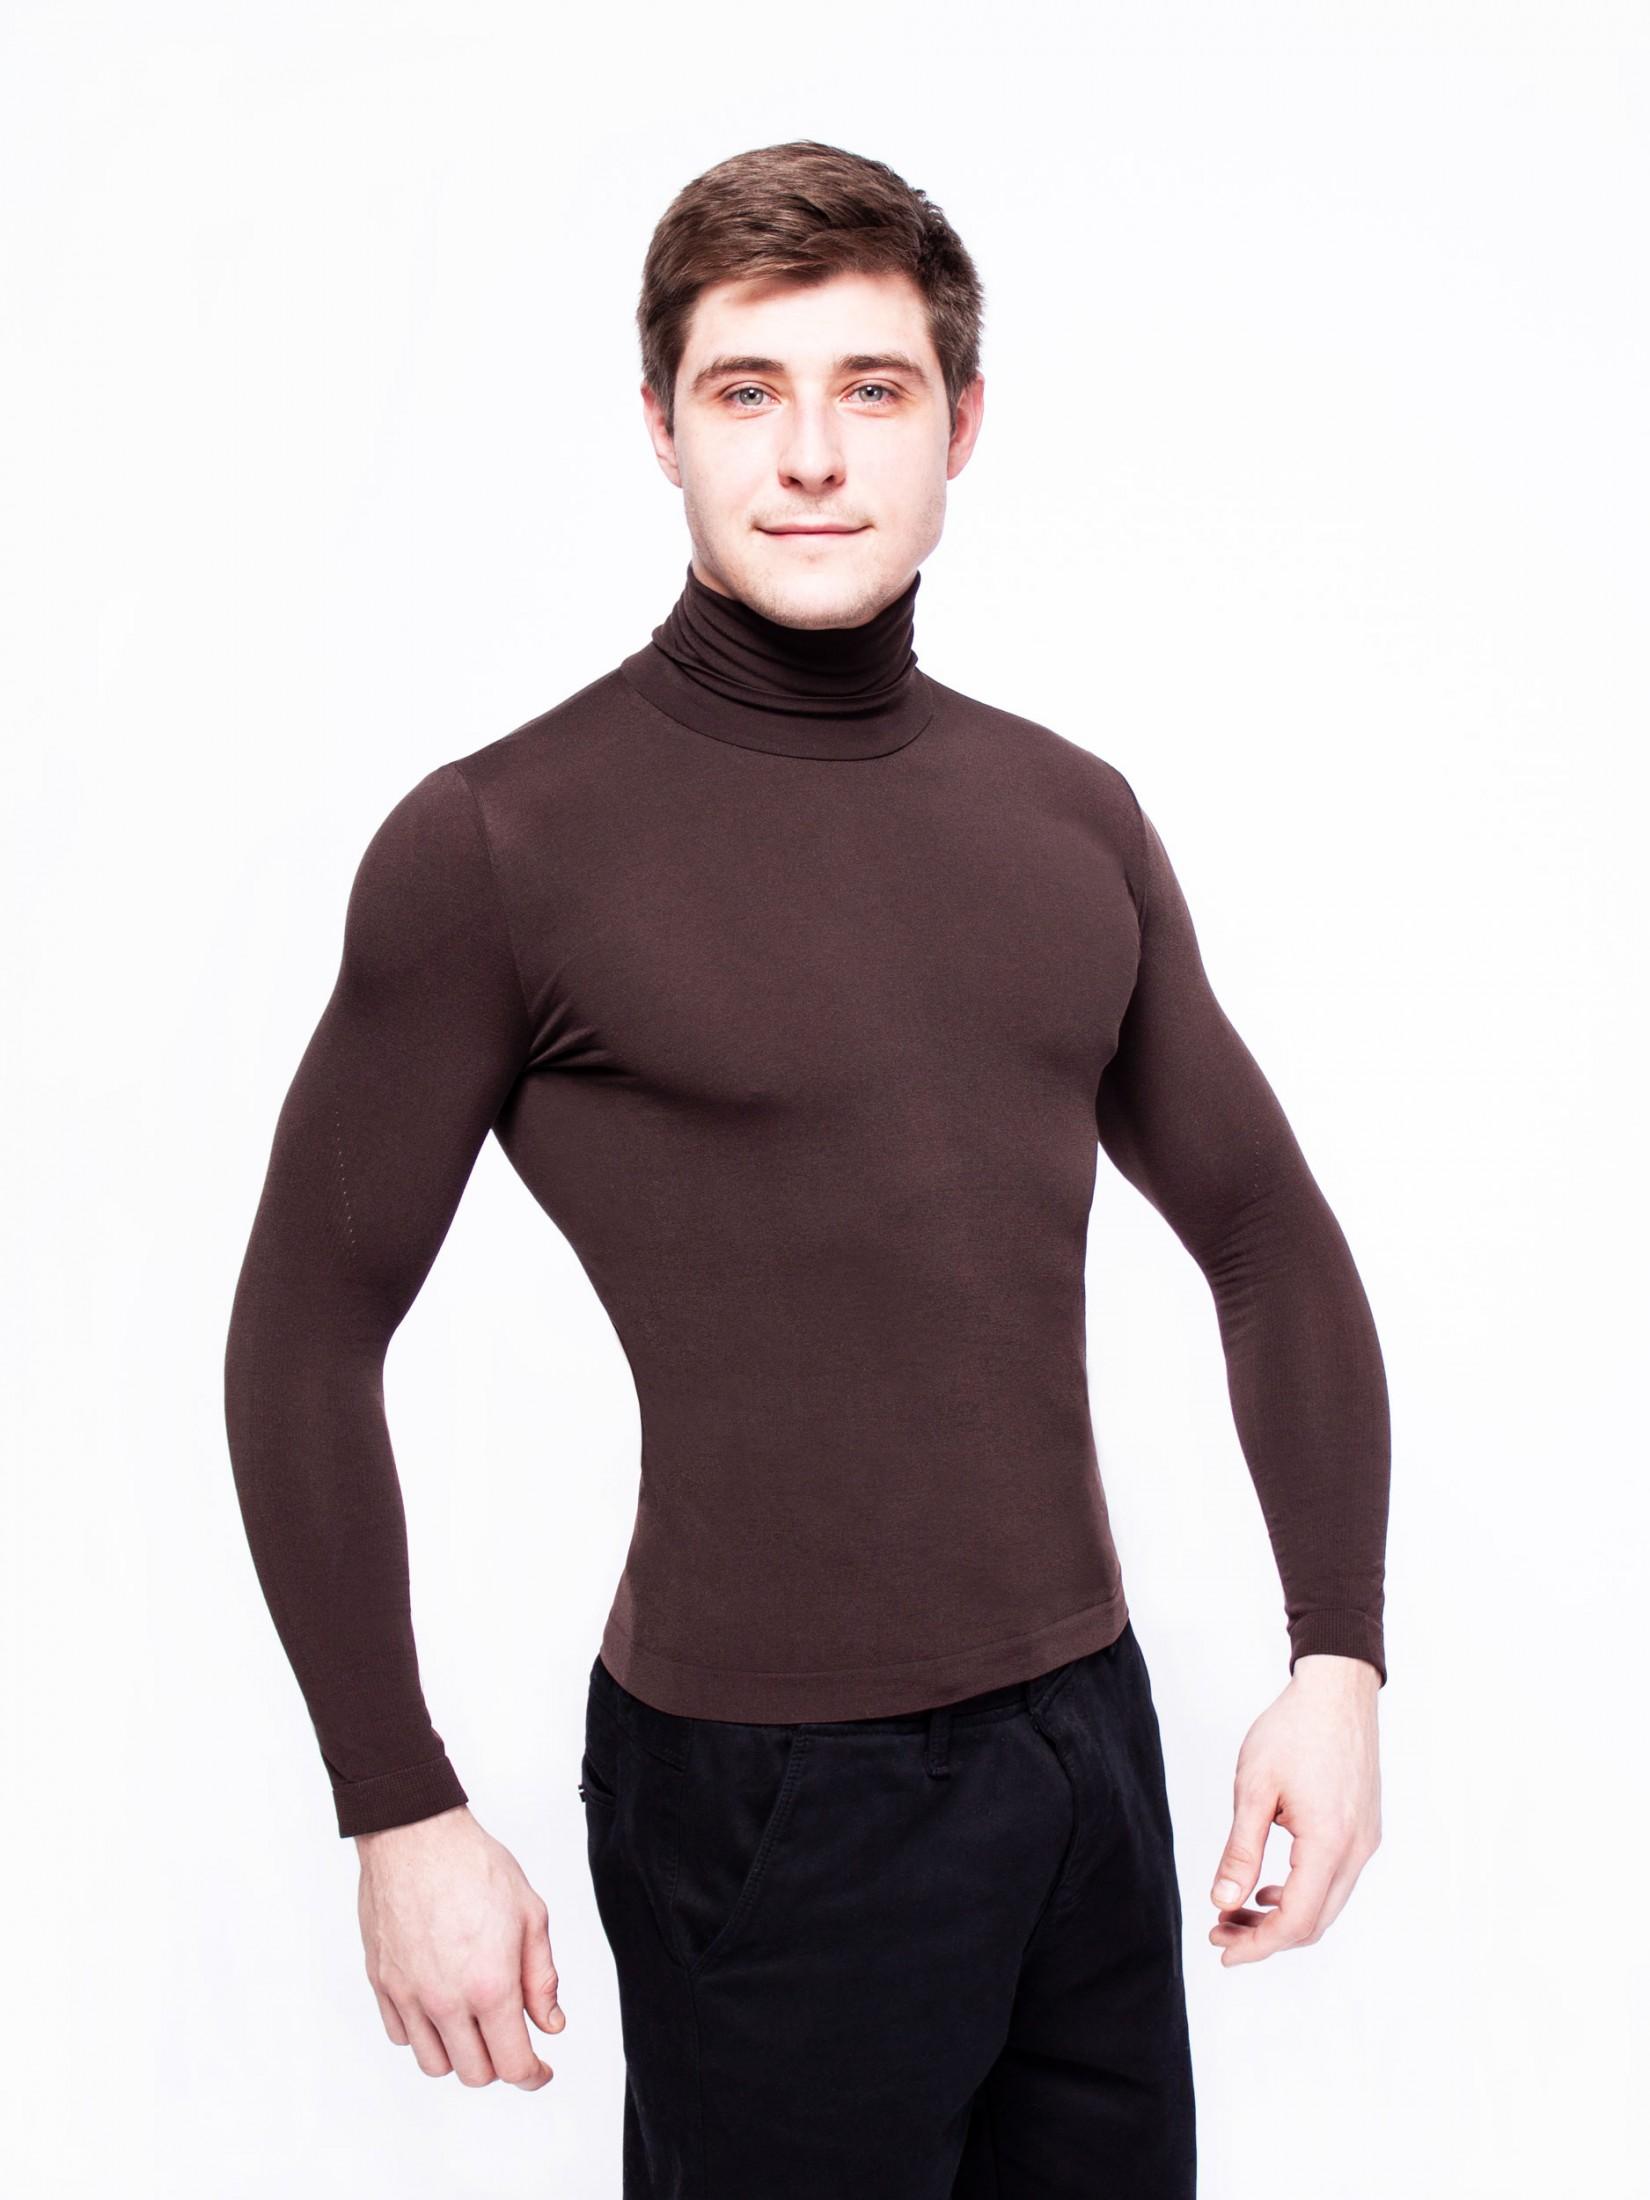 Водолазка мужская LUI Dolcevita Manica Lunga uomo коричневая L